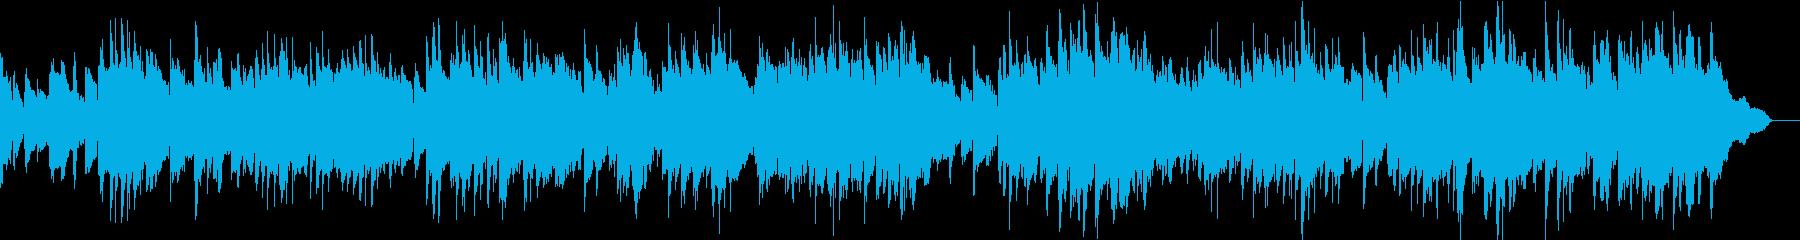 G線上のアリア/バッハ・アコギの再生済みの波形